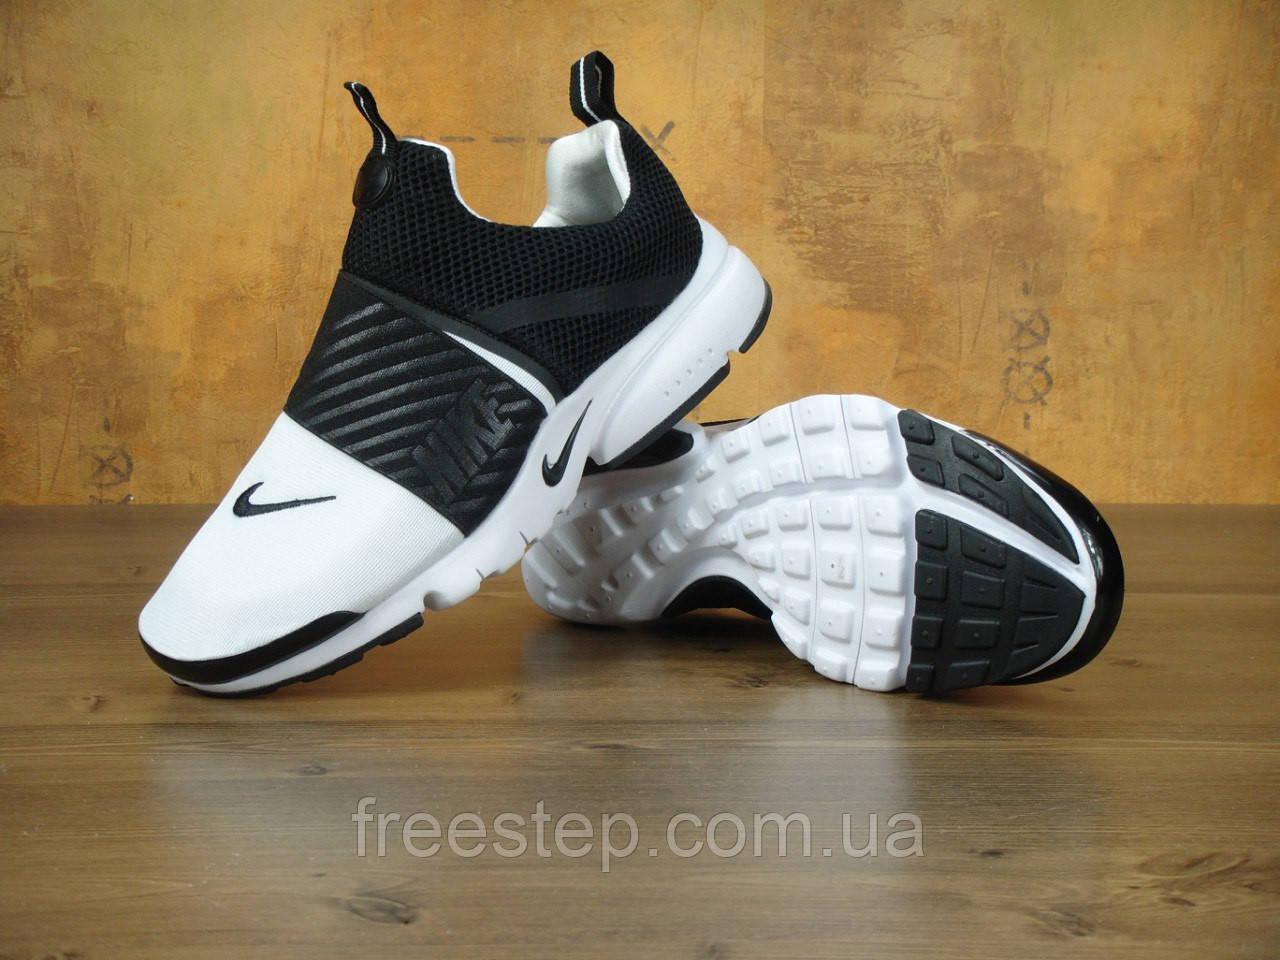 new concept 460ea 923b6 Мужские кроссовки в стиле NIKE Air Presto Extreme - Интернет-магазин